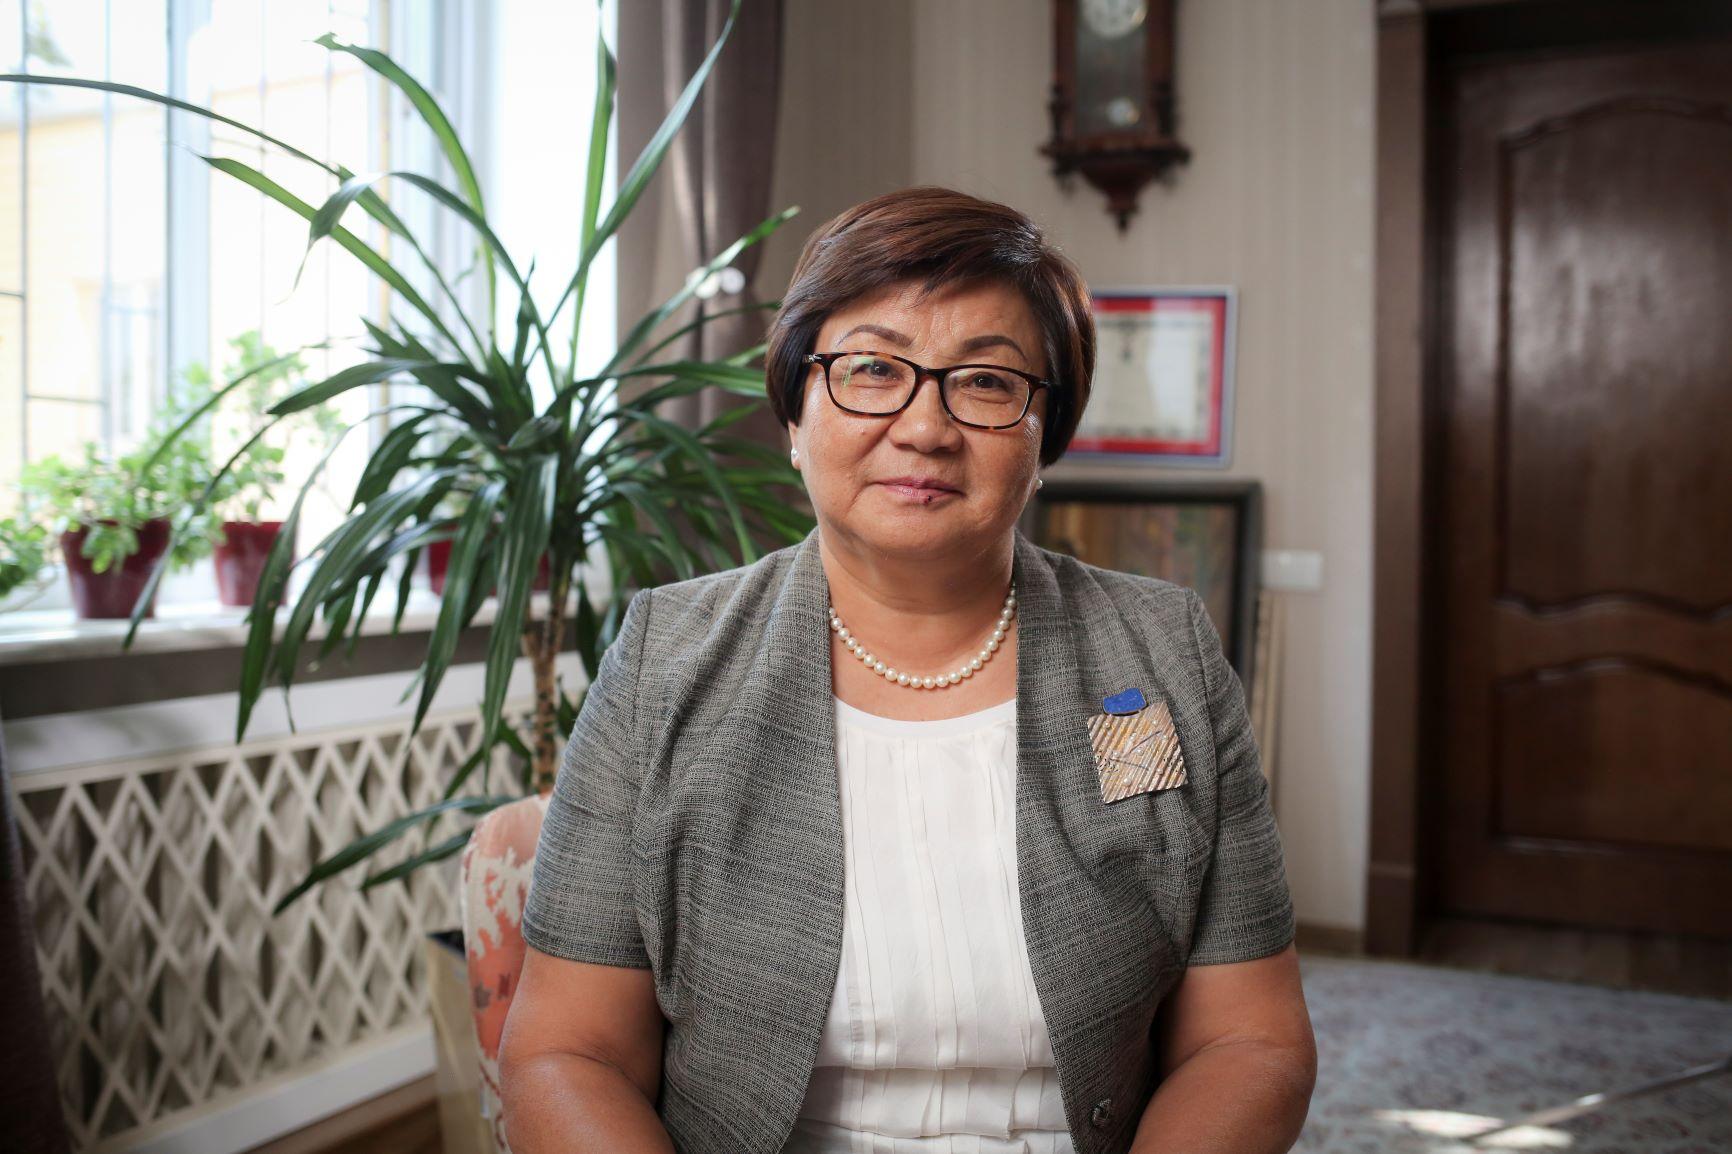 President Roza Isakovna Otunbayeva - Former President of Kyrgyzstan (2010-2011) and 2018 Common Ground Awardee